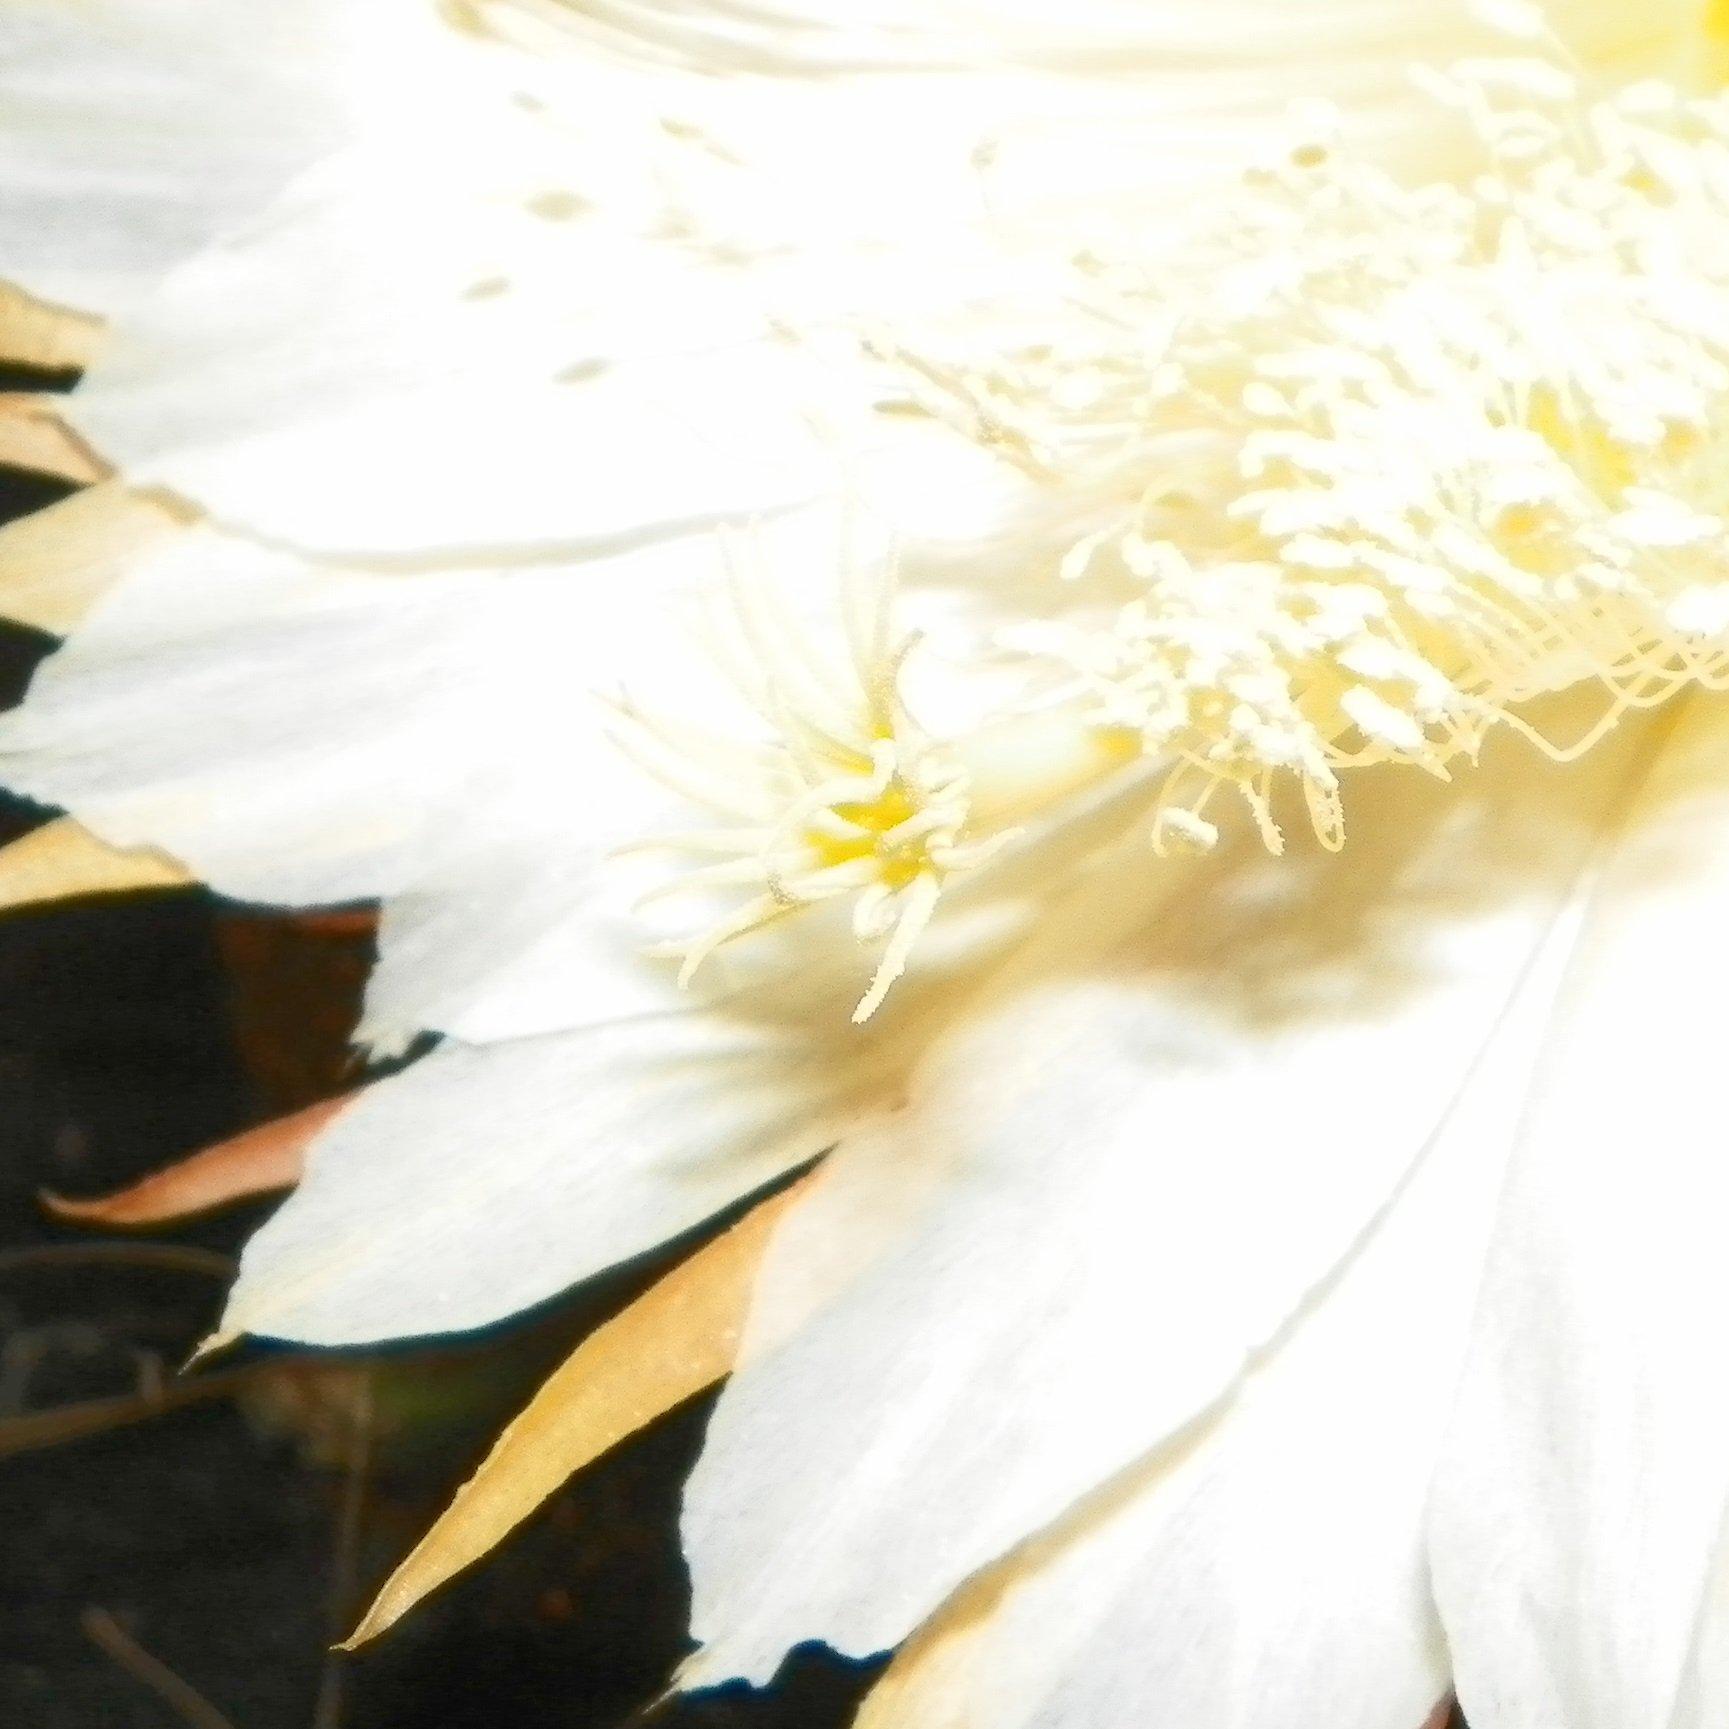 Selenicereus Hondurensis flower stigma